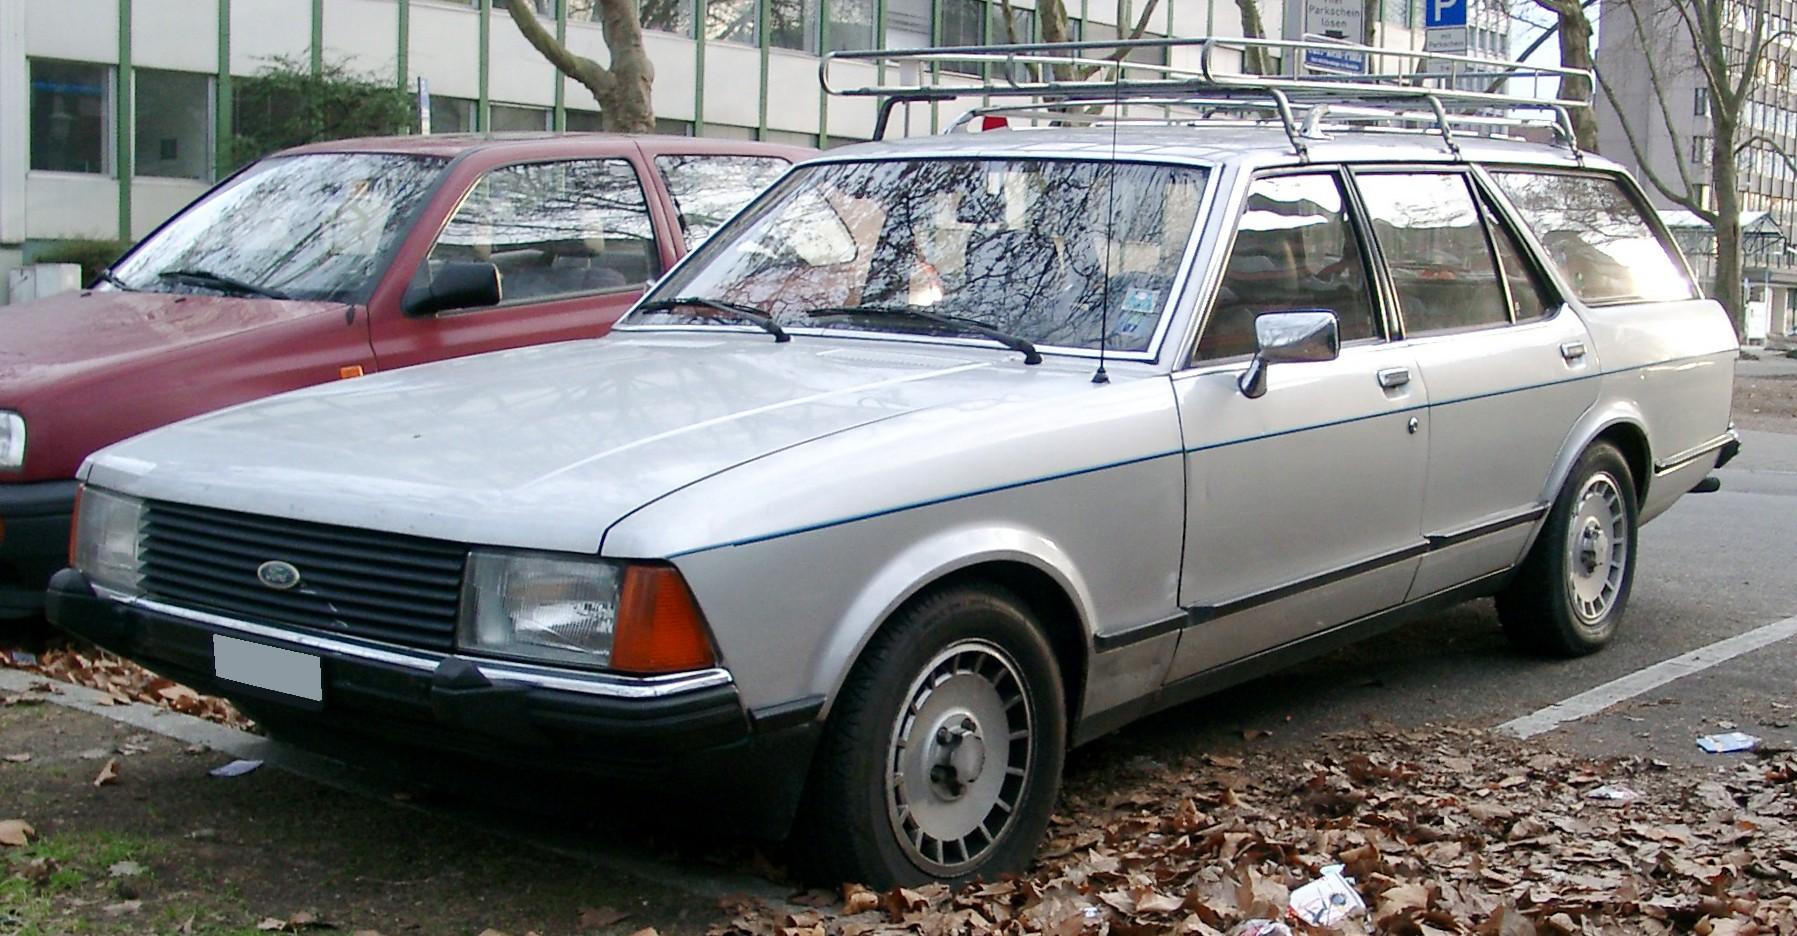 File:Ford Granada front 20080127.jpg - Wikimedia Commons